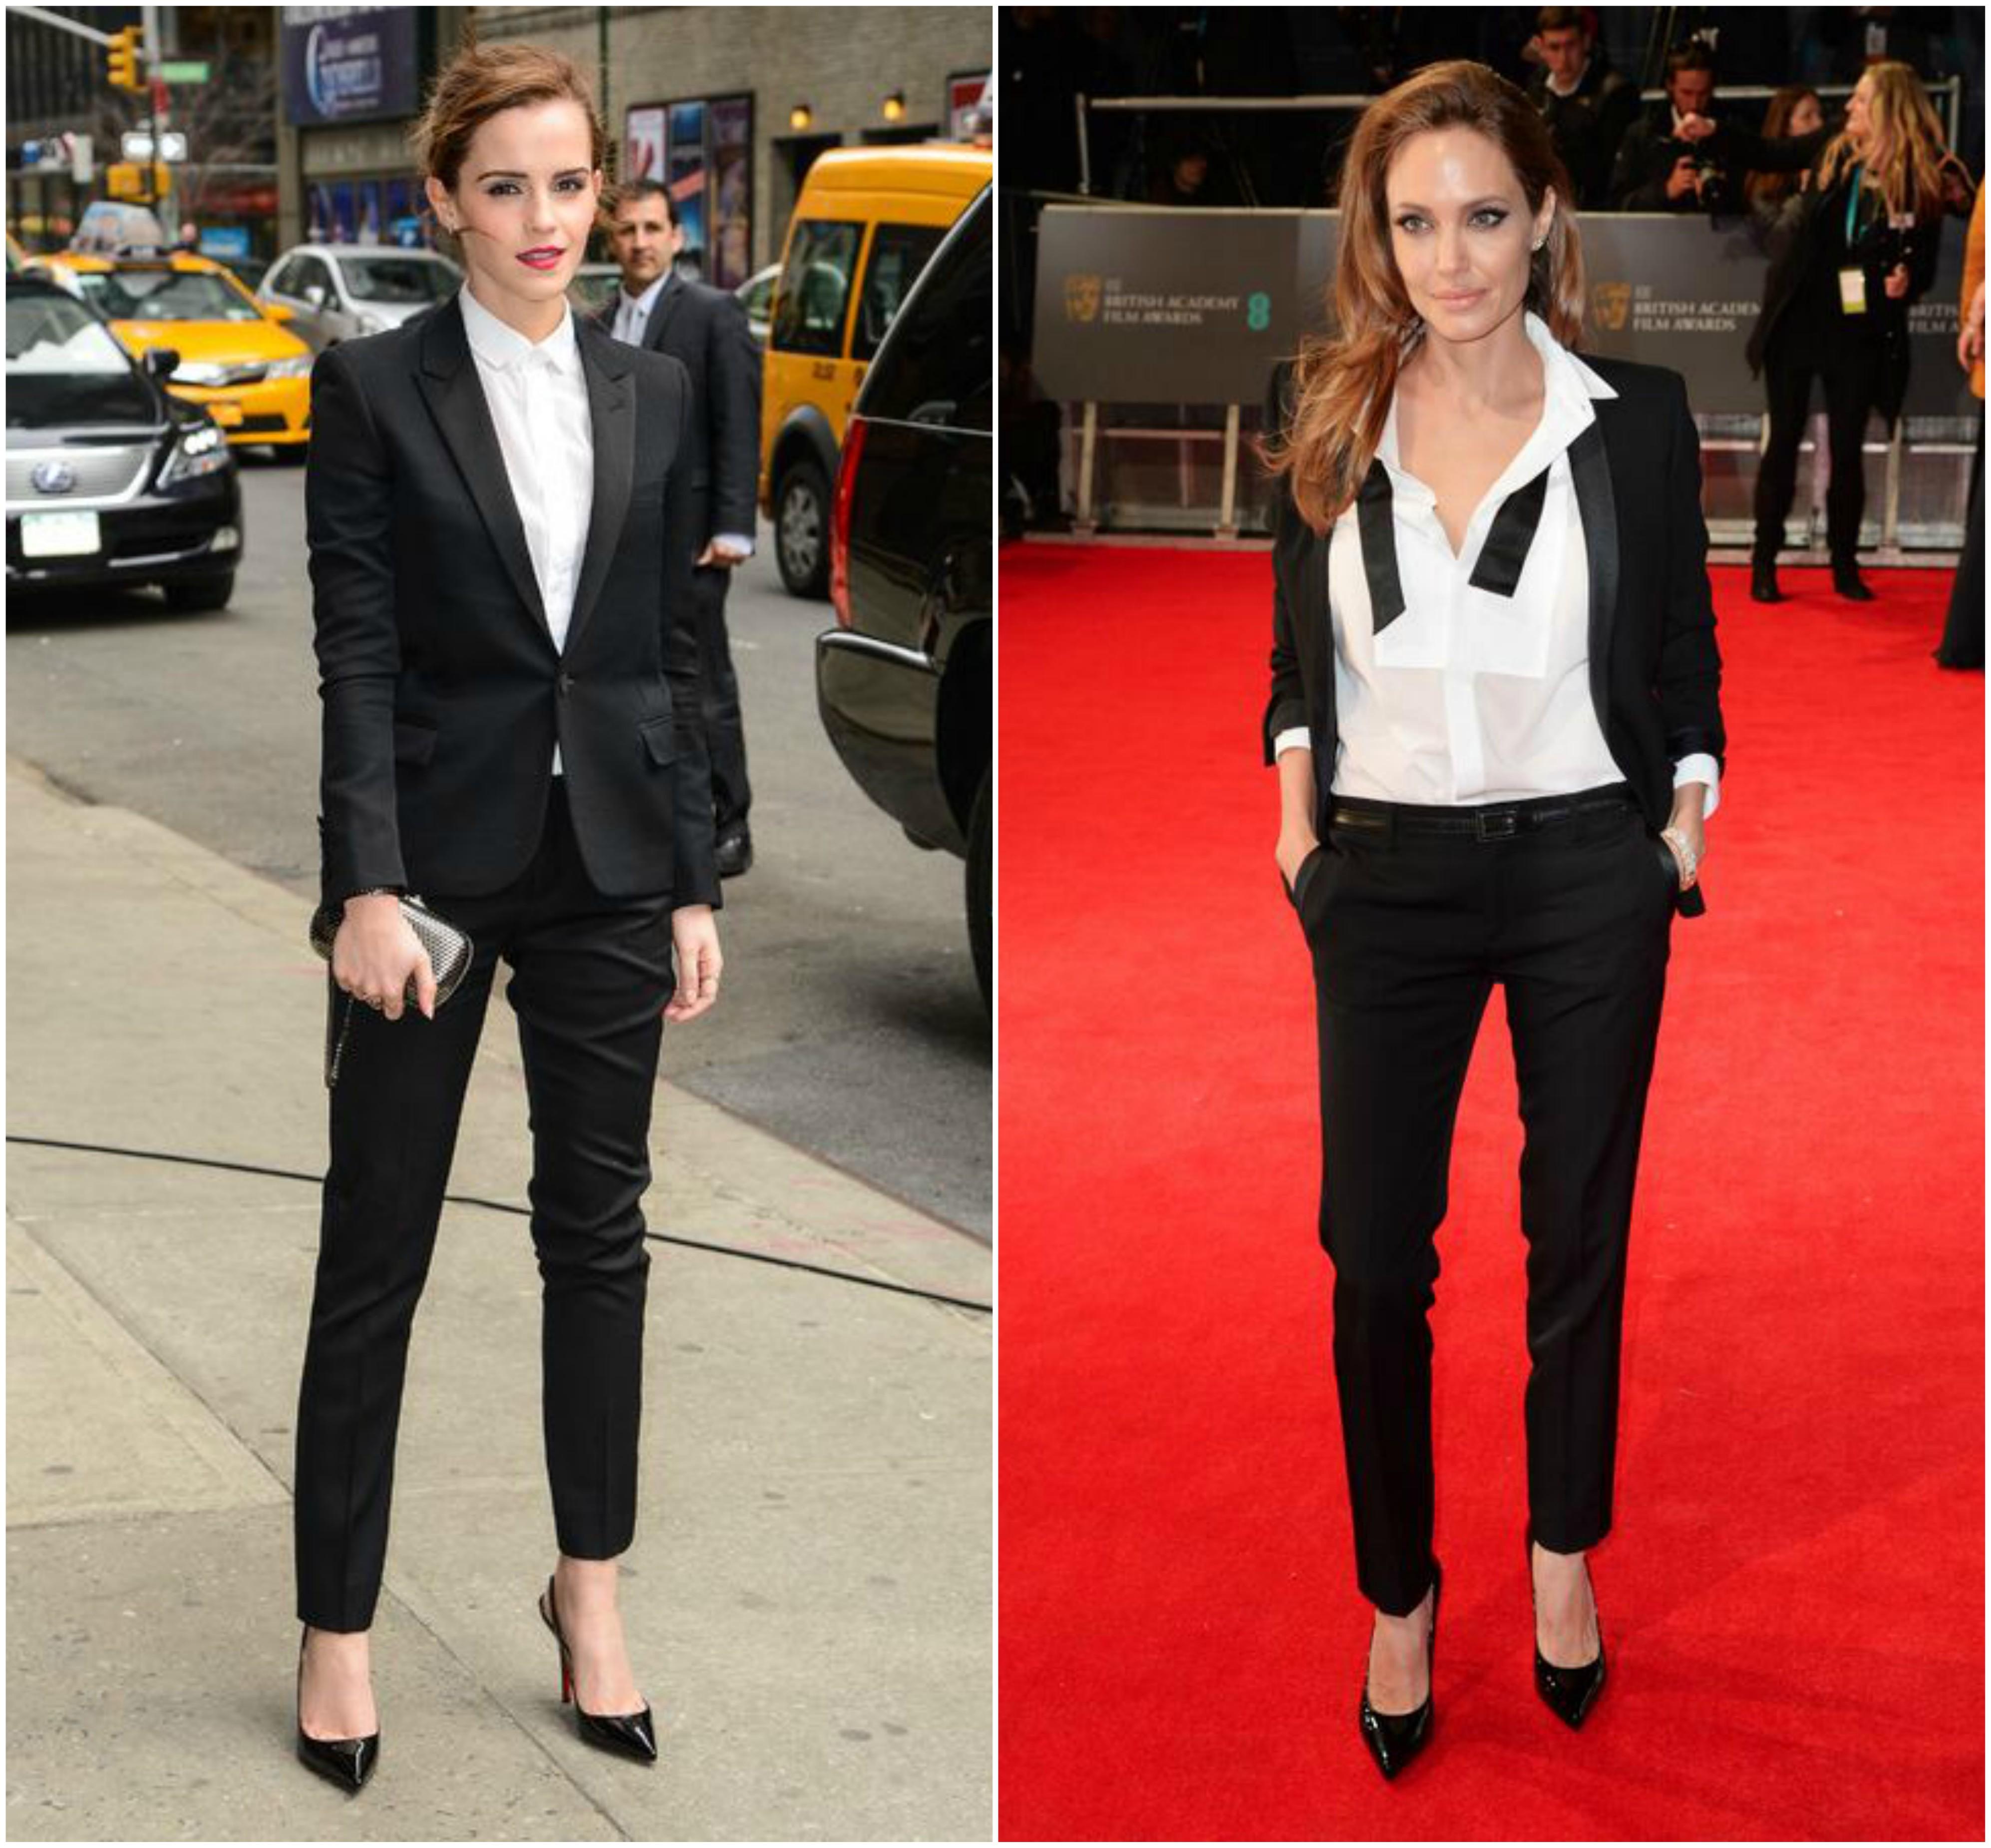 size 7 nice cheap cheap Tailleur femminile: come indossare giacca e pantalone nel ...